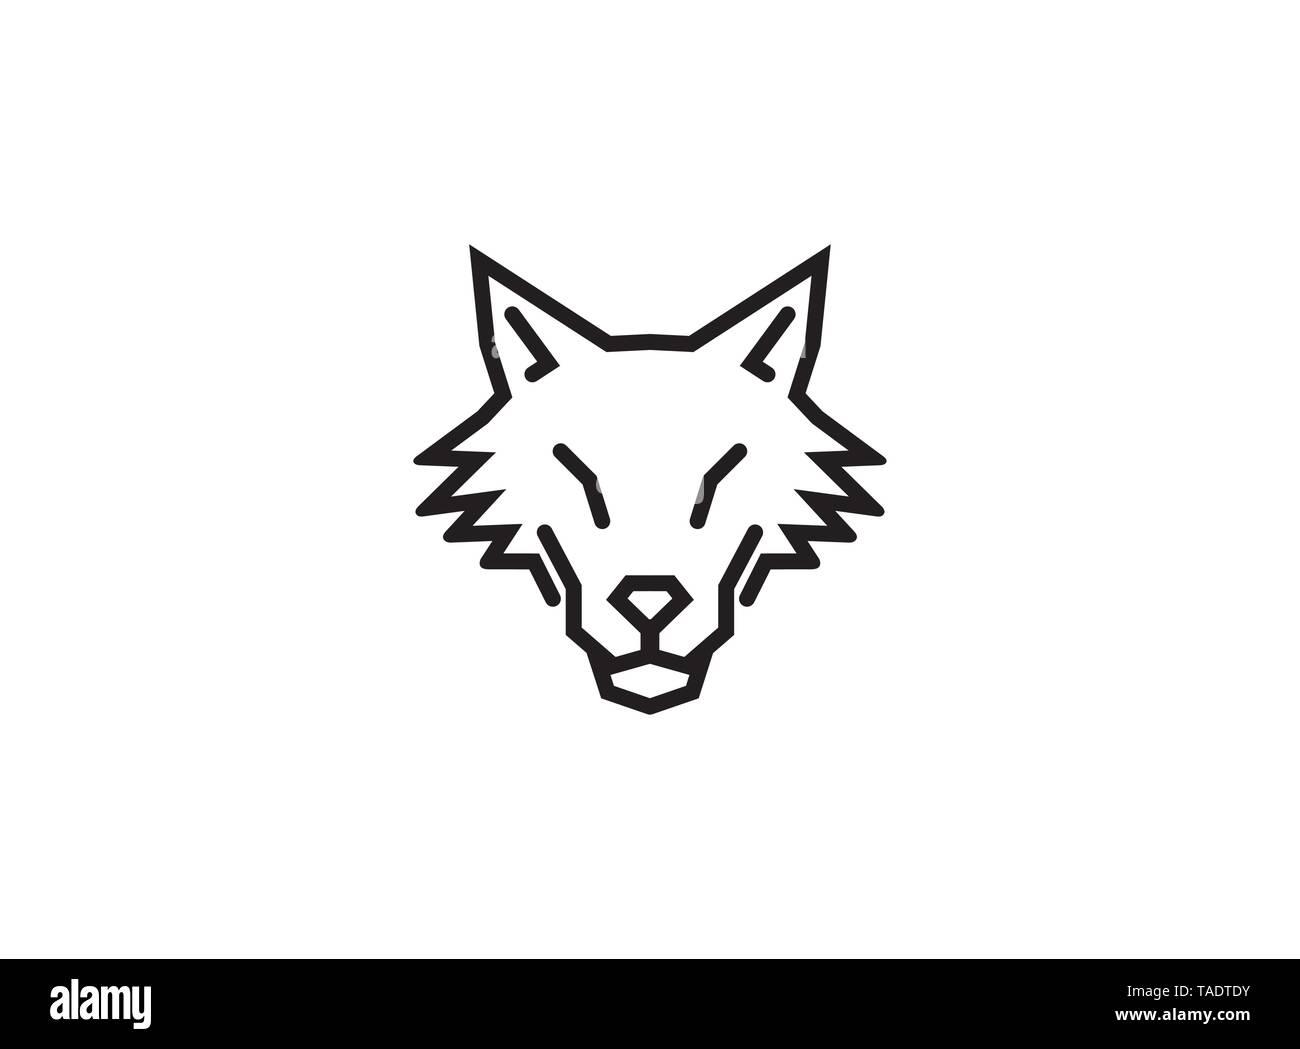 Creative Abstract Wolf Logo Vector Design Illustration Stock